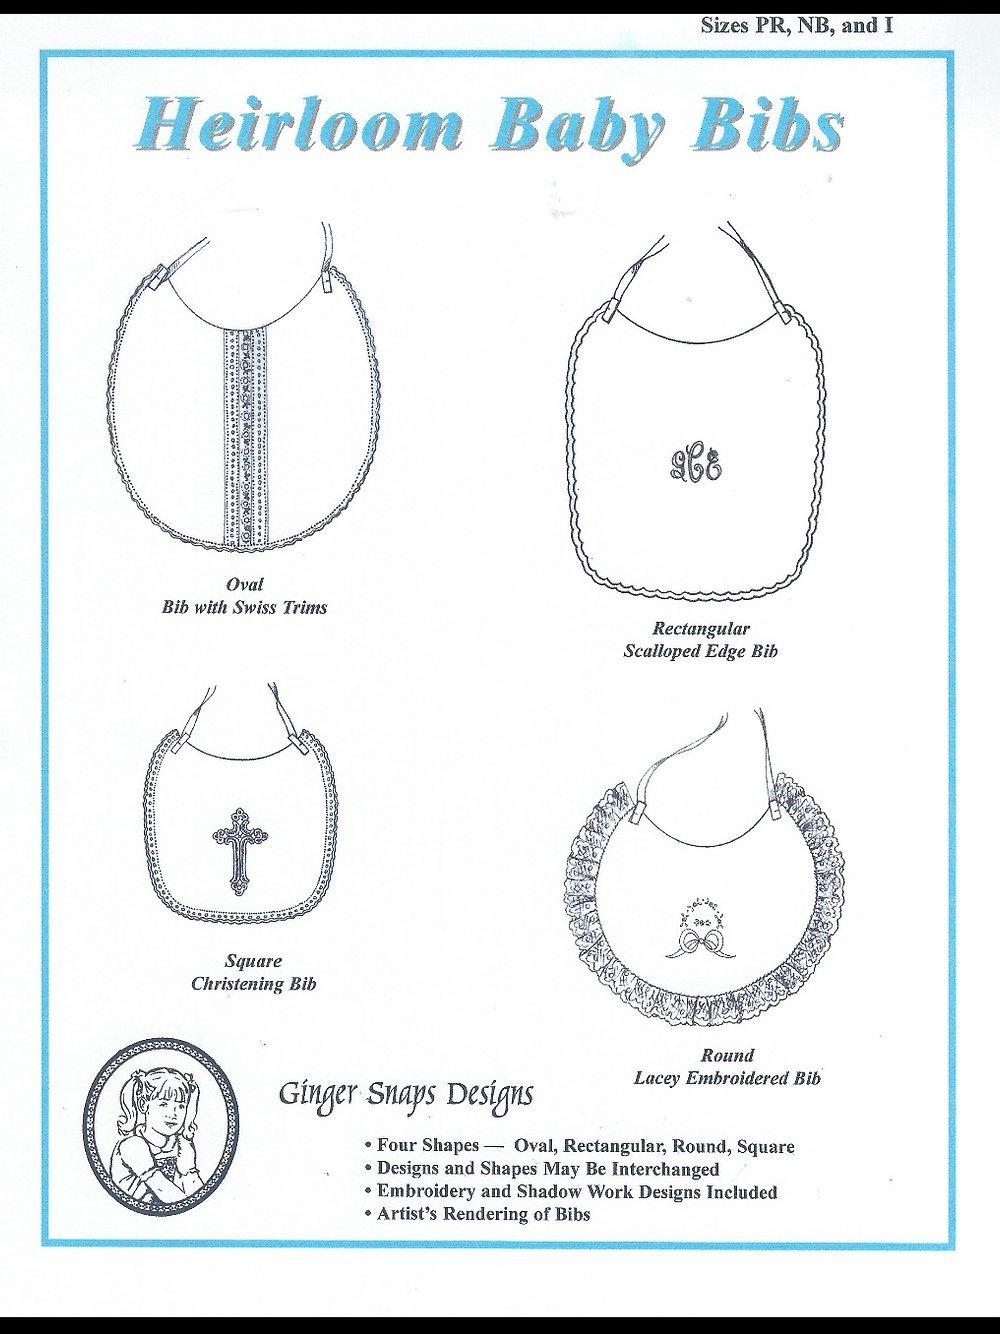 Ginger Snaps Designs Heirloom Baby Bibs